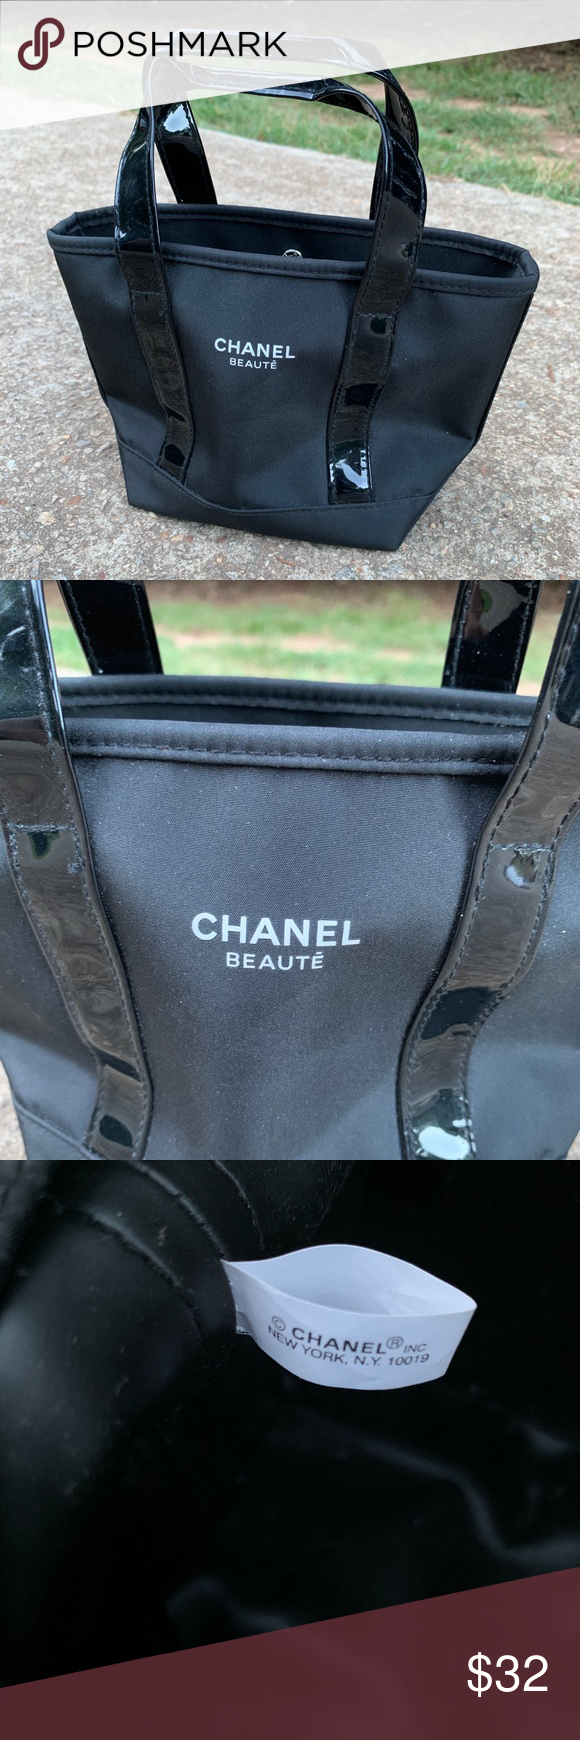 Chanel Beaute Makeup Bag Small Chanel bag, Bags, Small bags